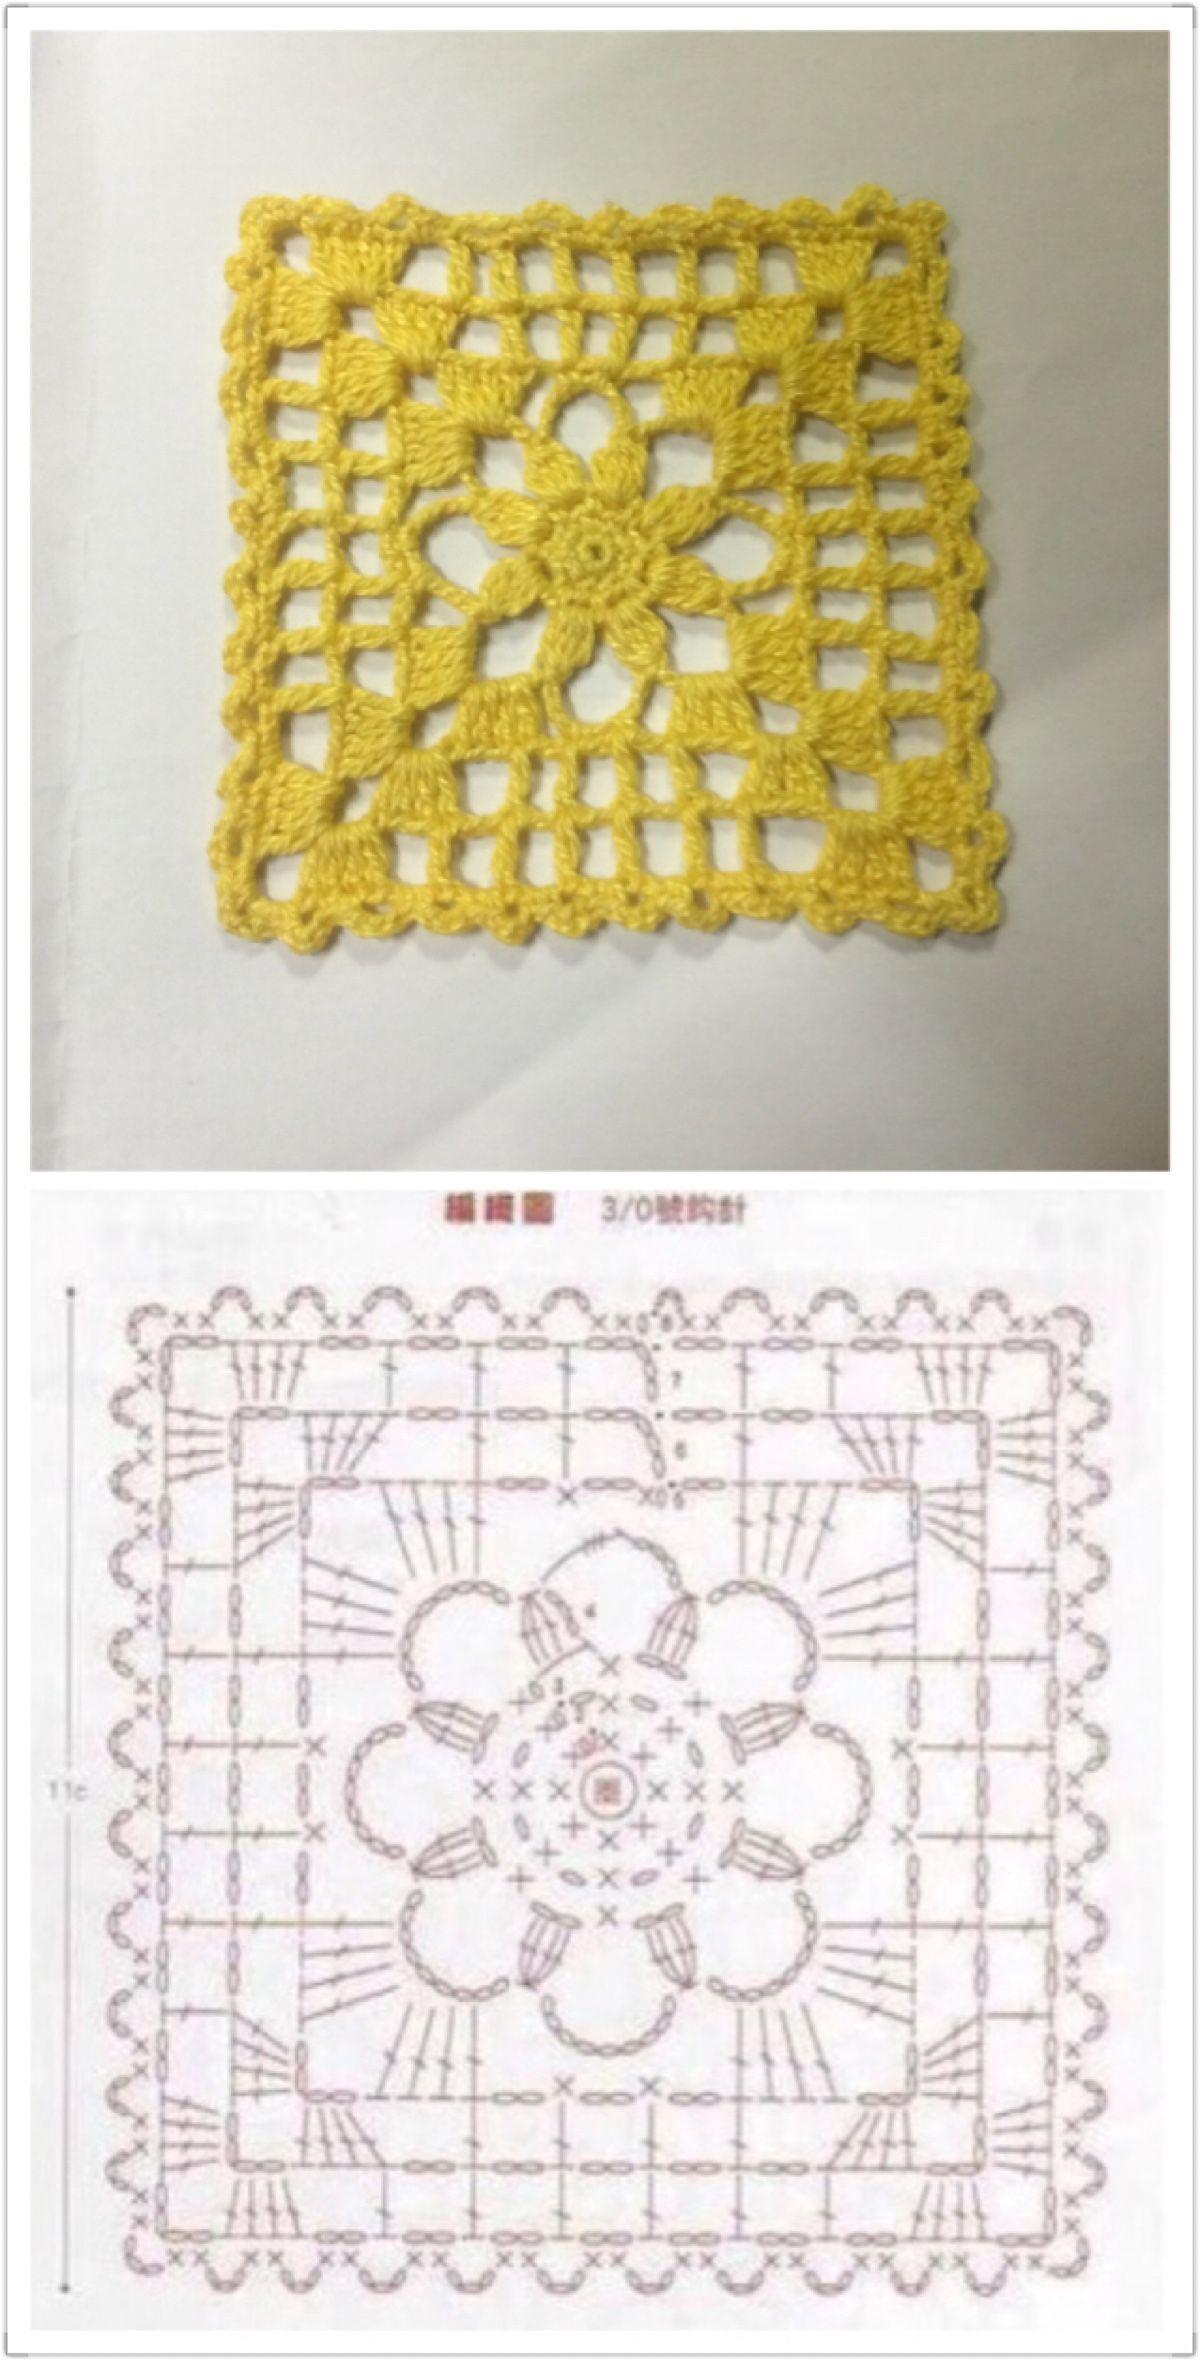 Pin de Tiina Hellaste en Knitting | Pinterest | Ganchillo, Cuadrados ...